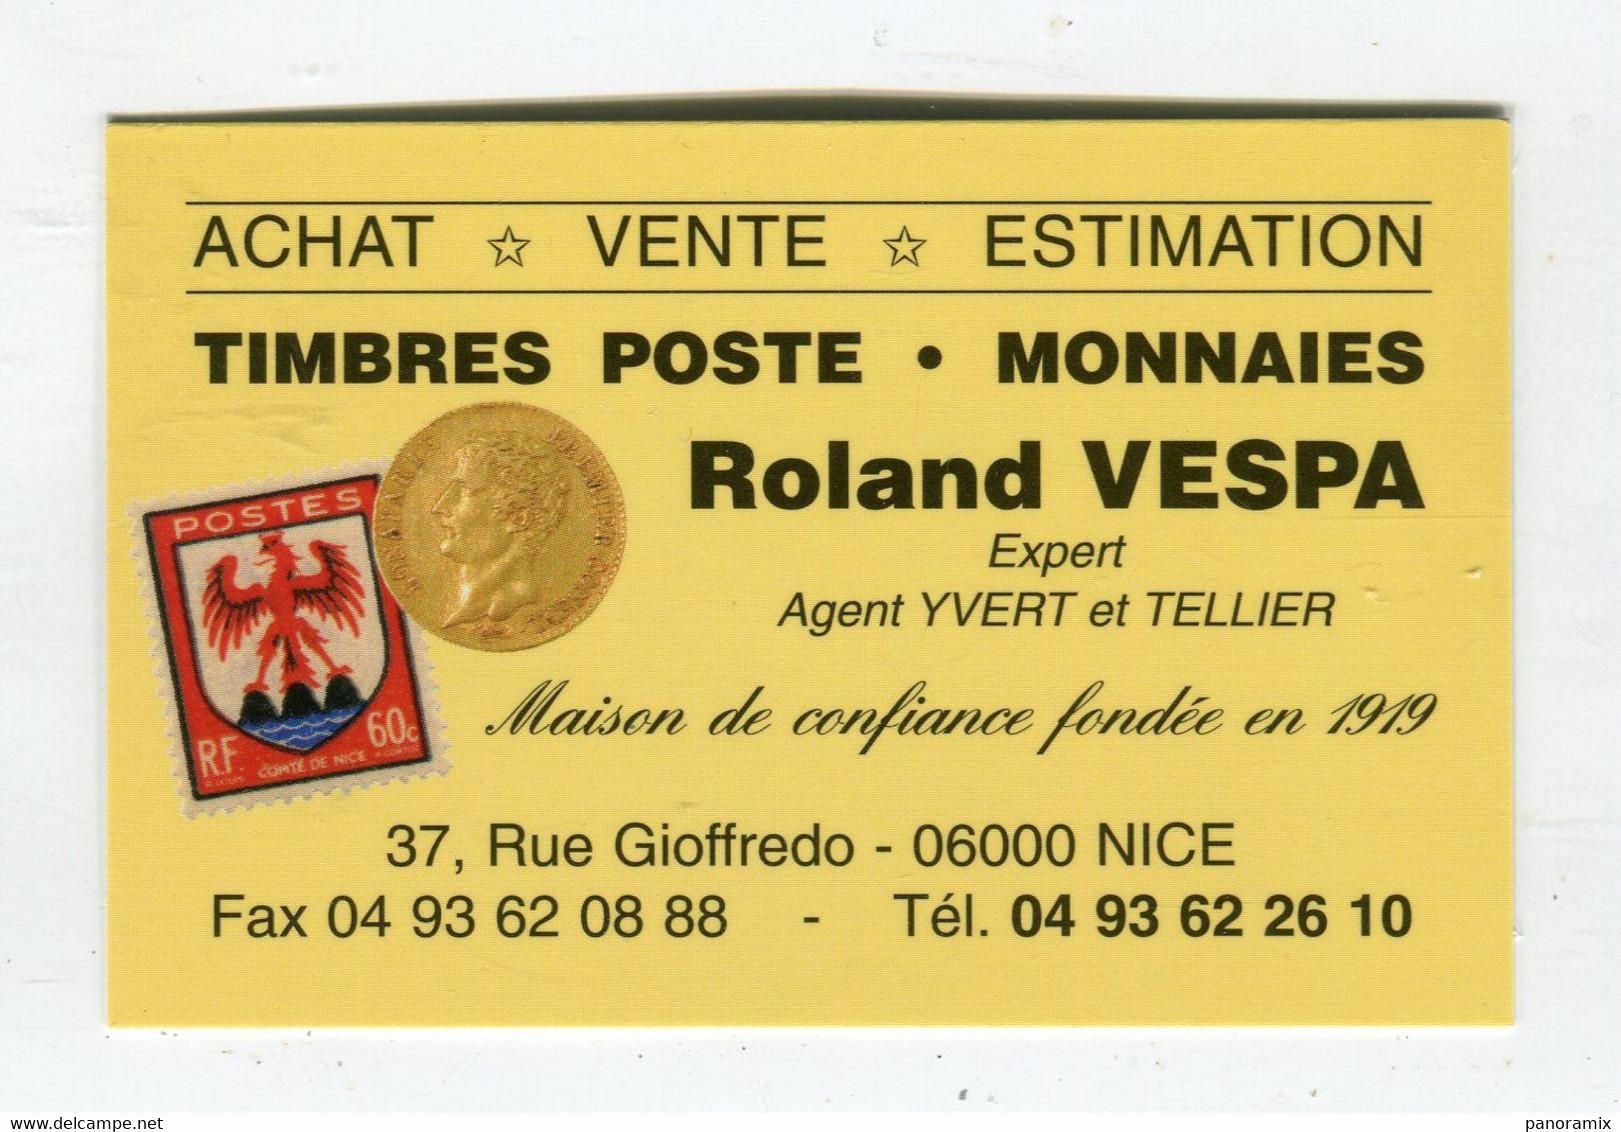 Carte De Visite °_ Carton-Timbres Poste-Monnaies-Roland-06 Nice - Visiting Cards